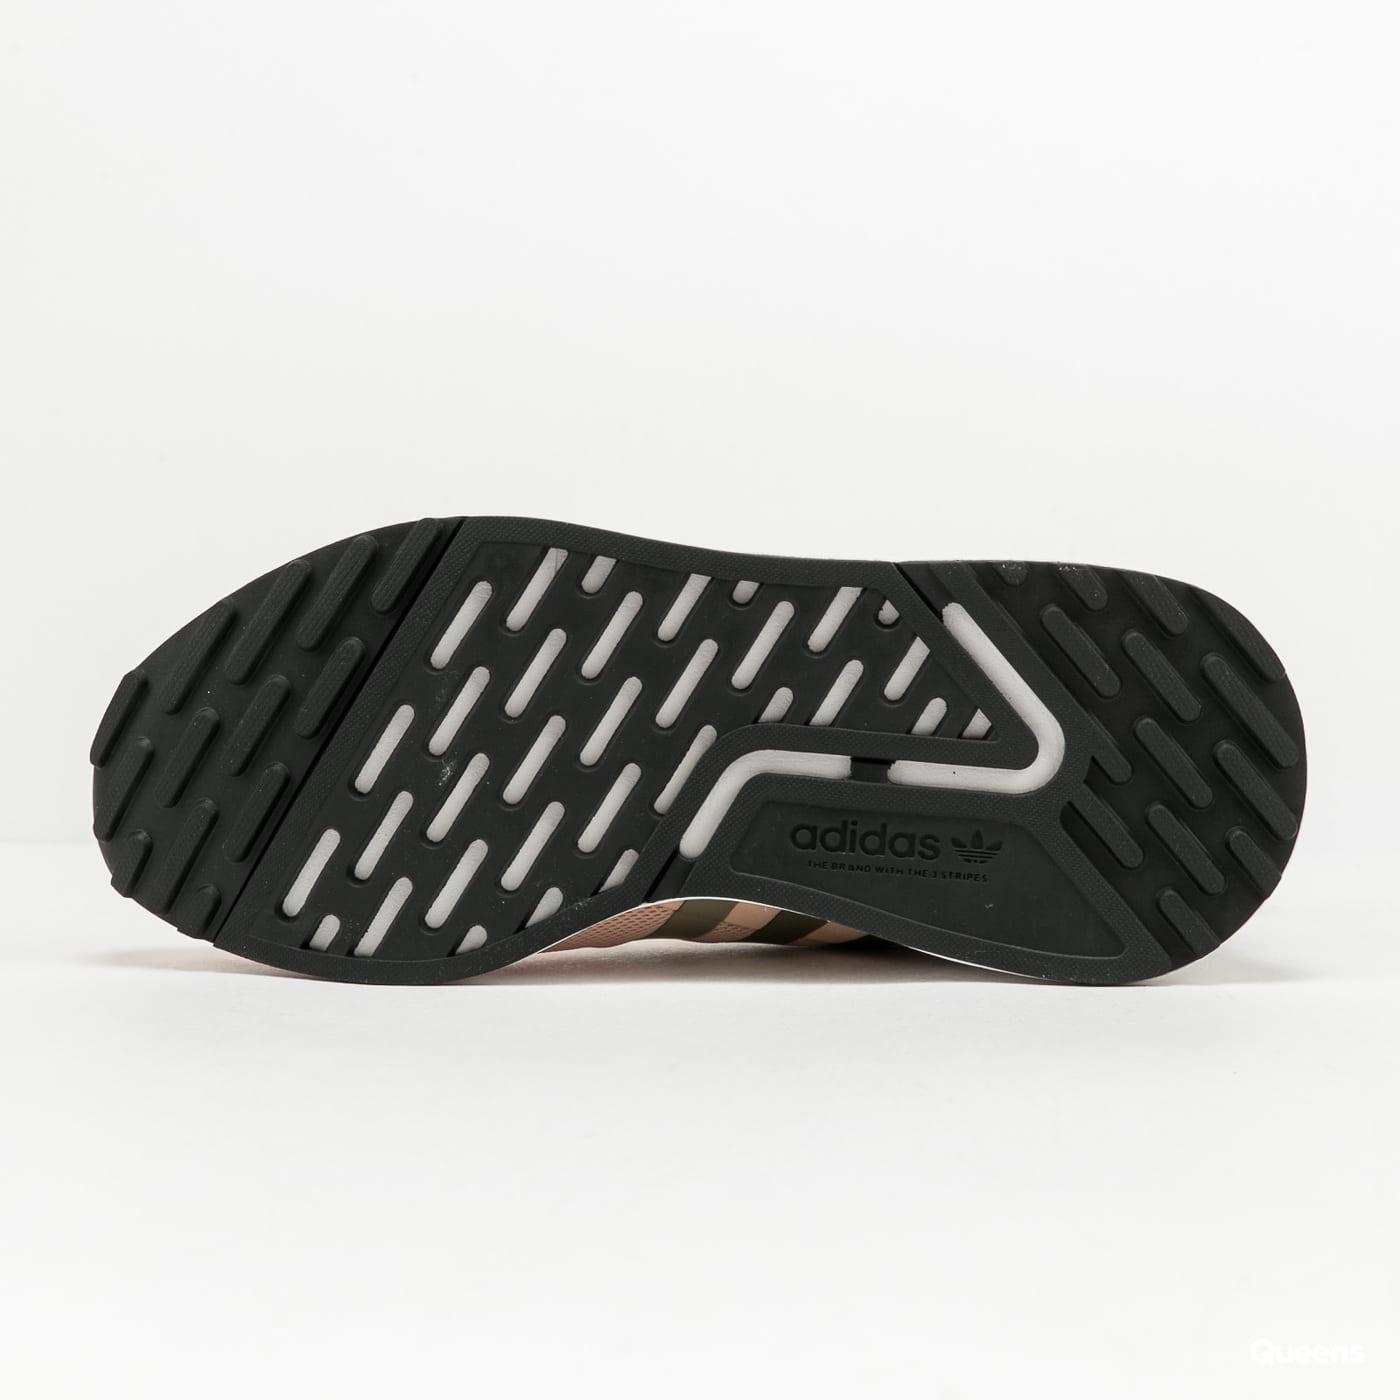 adidas Originals Multix W halblu / feagry / cblack